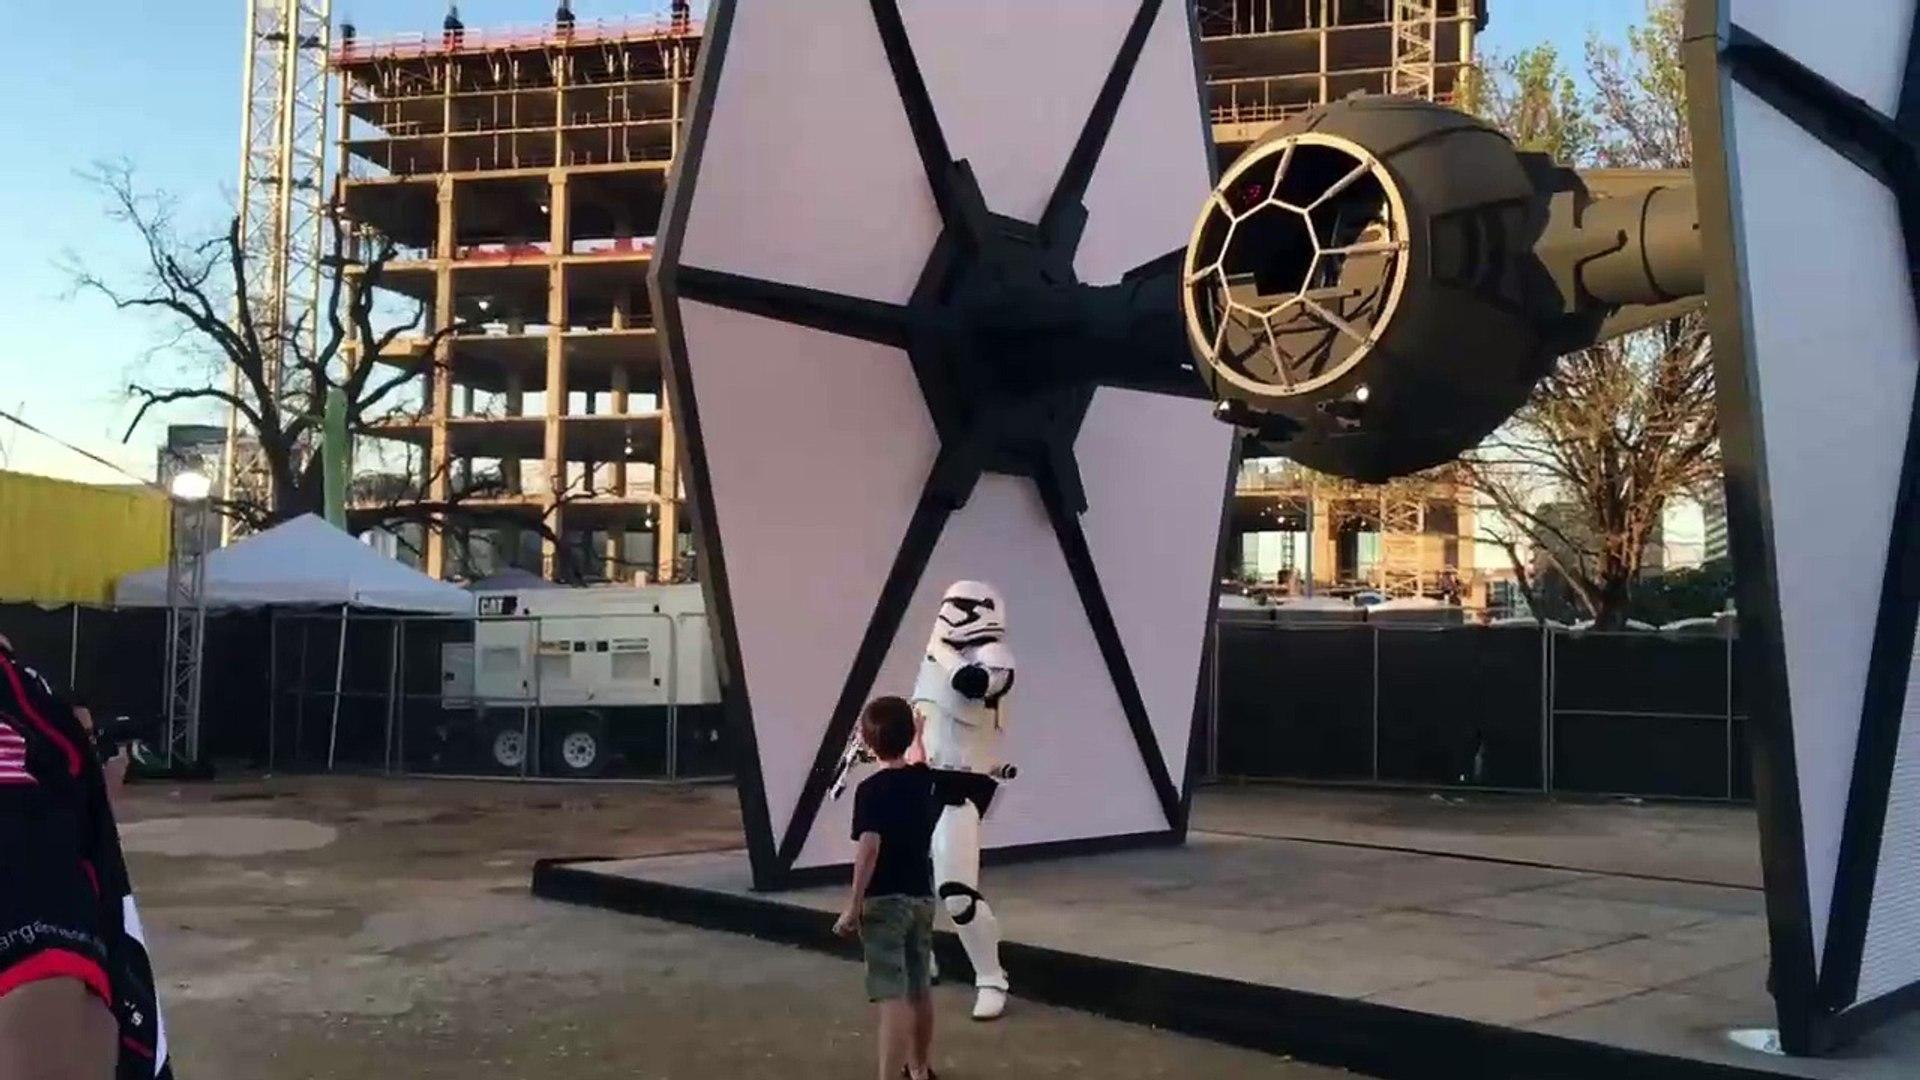 Construction starts on Disney's Star Wars Land